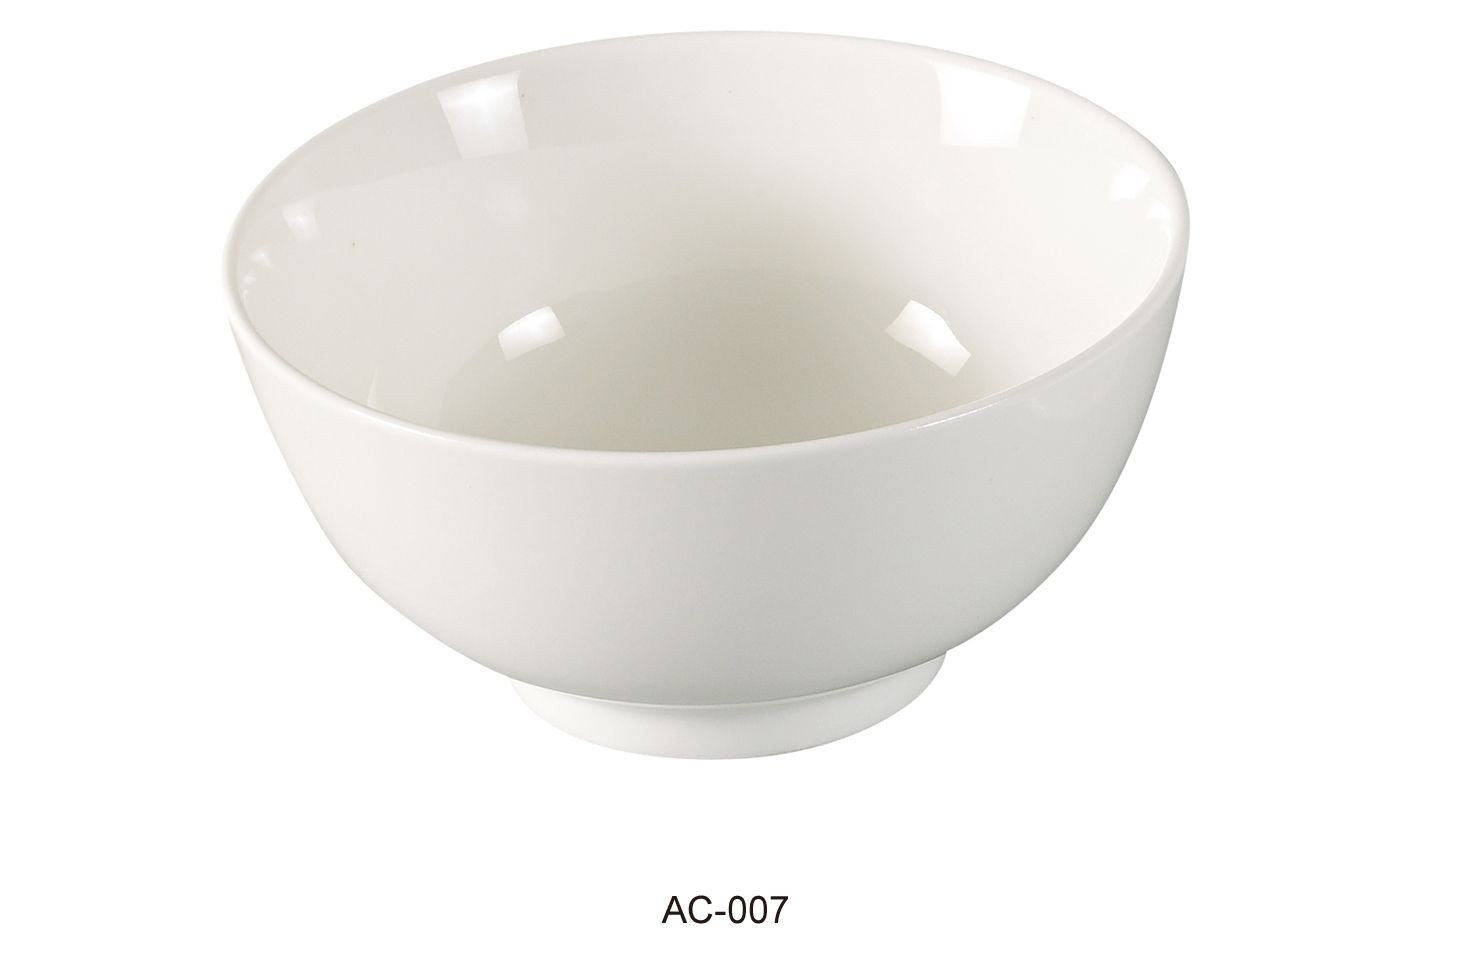 "Yanco AC-007 Abco 4 1/2"" Rice Bowl 8.5 oz."